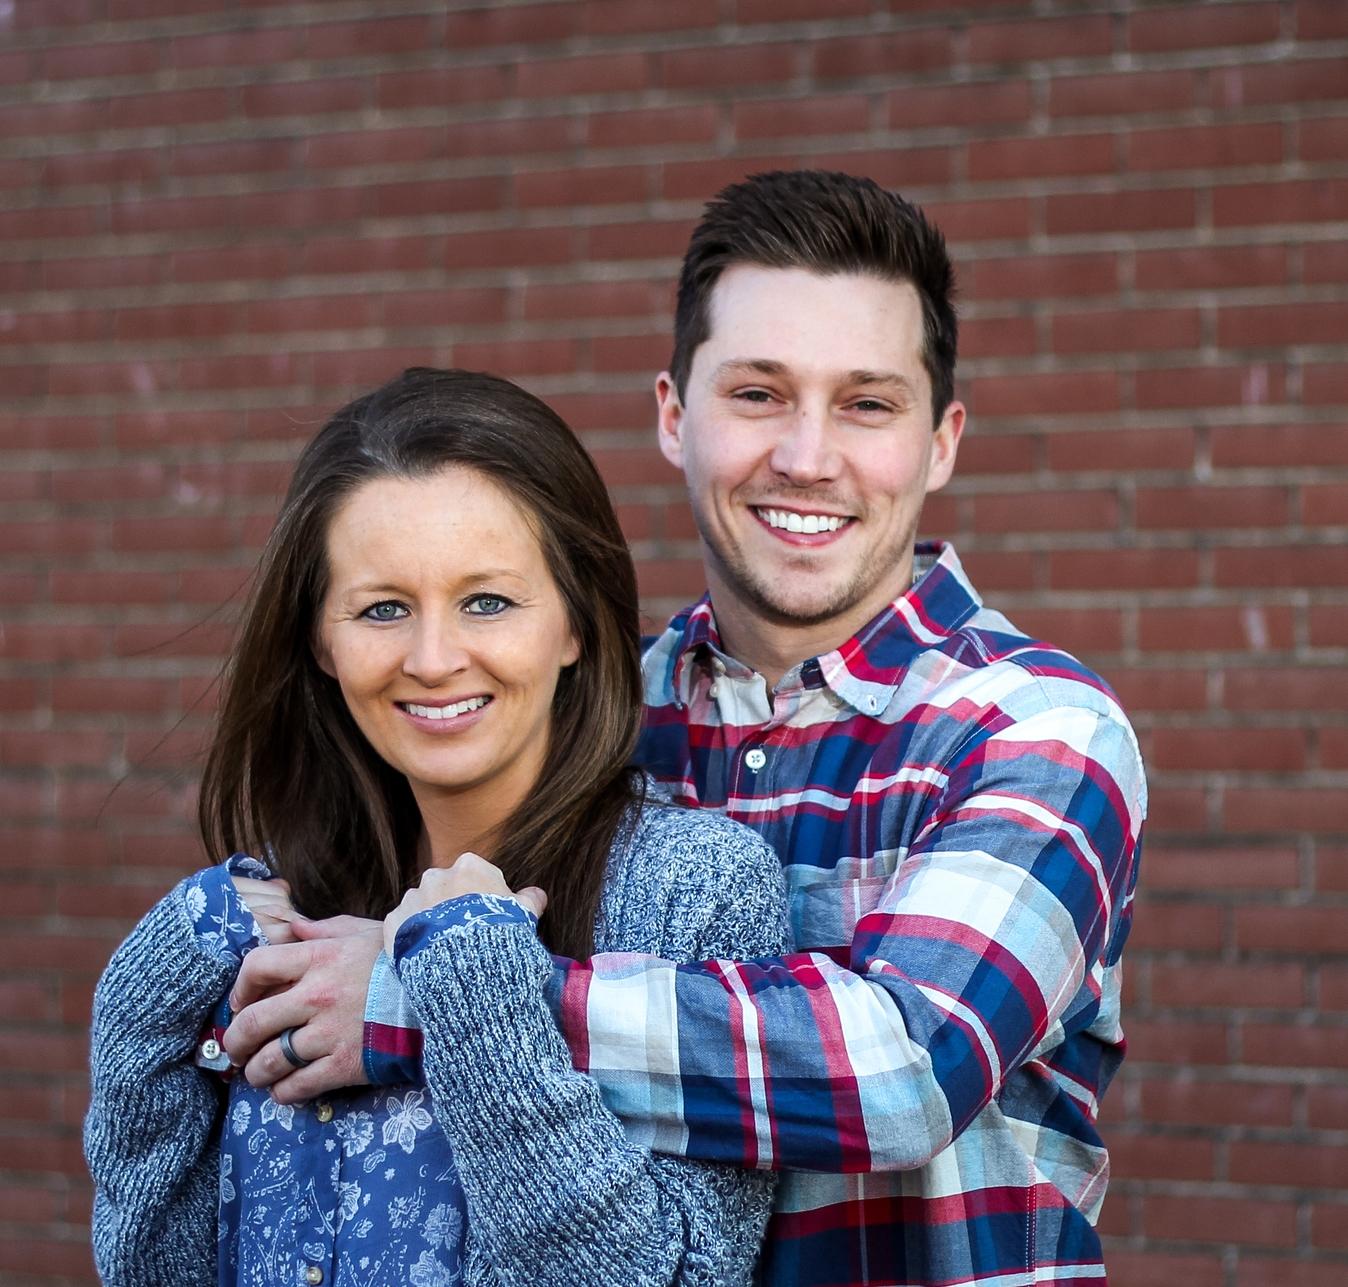 Dustin and Sheri Crawford of True North Community Church in Atlanta